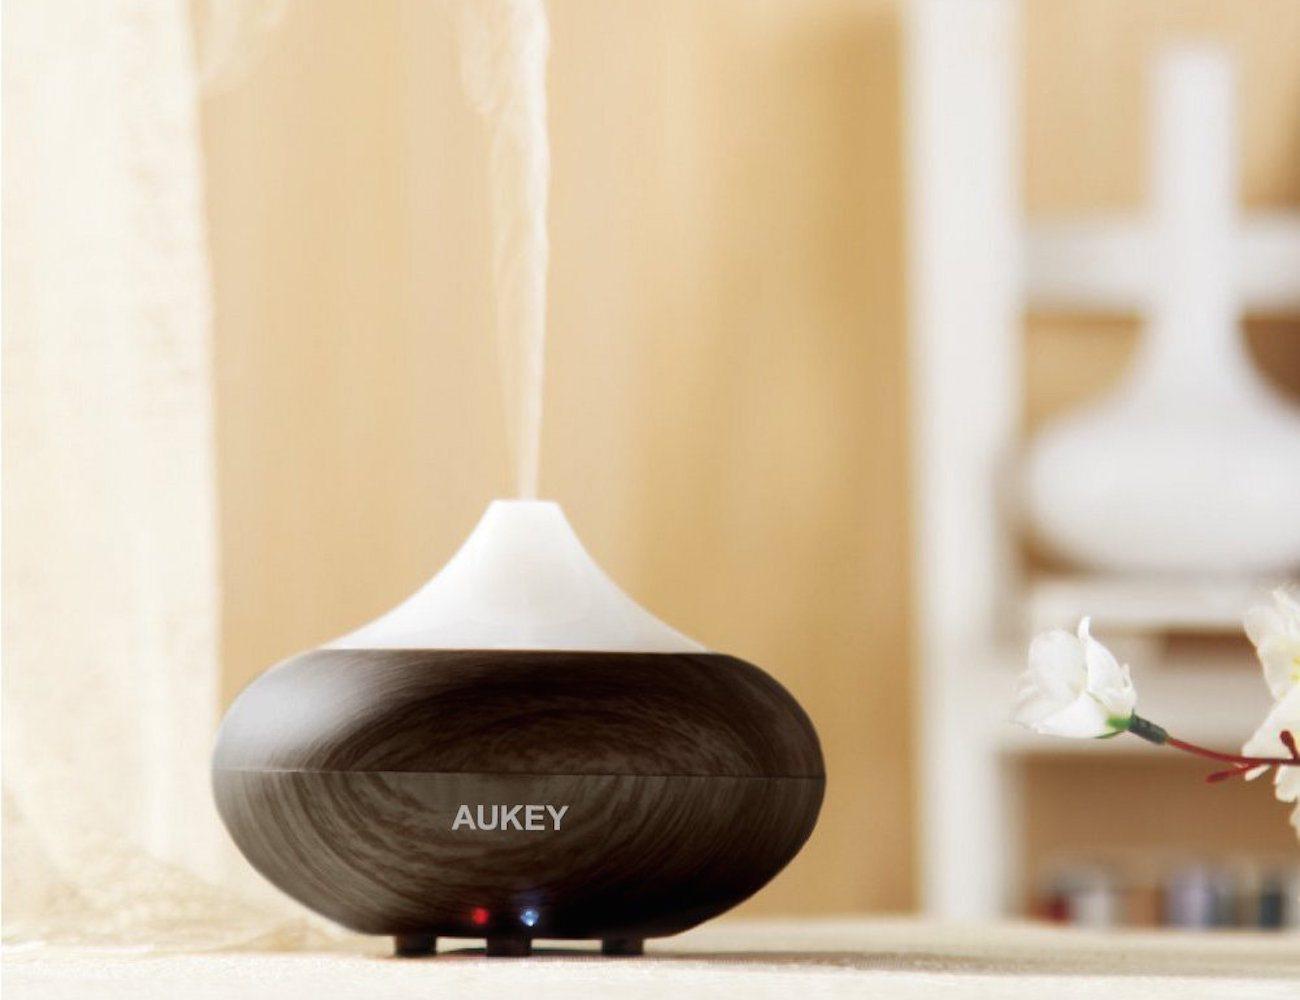 "Aukey Electric <em class=""algolia-search-highlight"">Aromather</em>apy Essential Oil Diffuser"